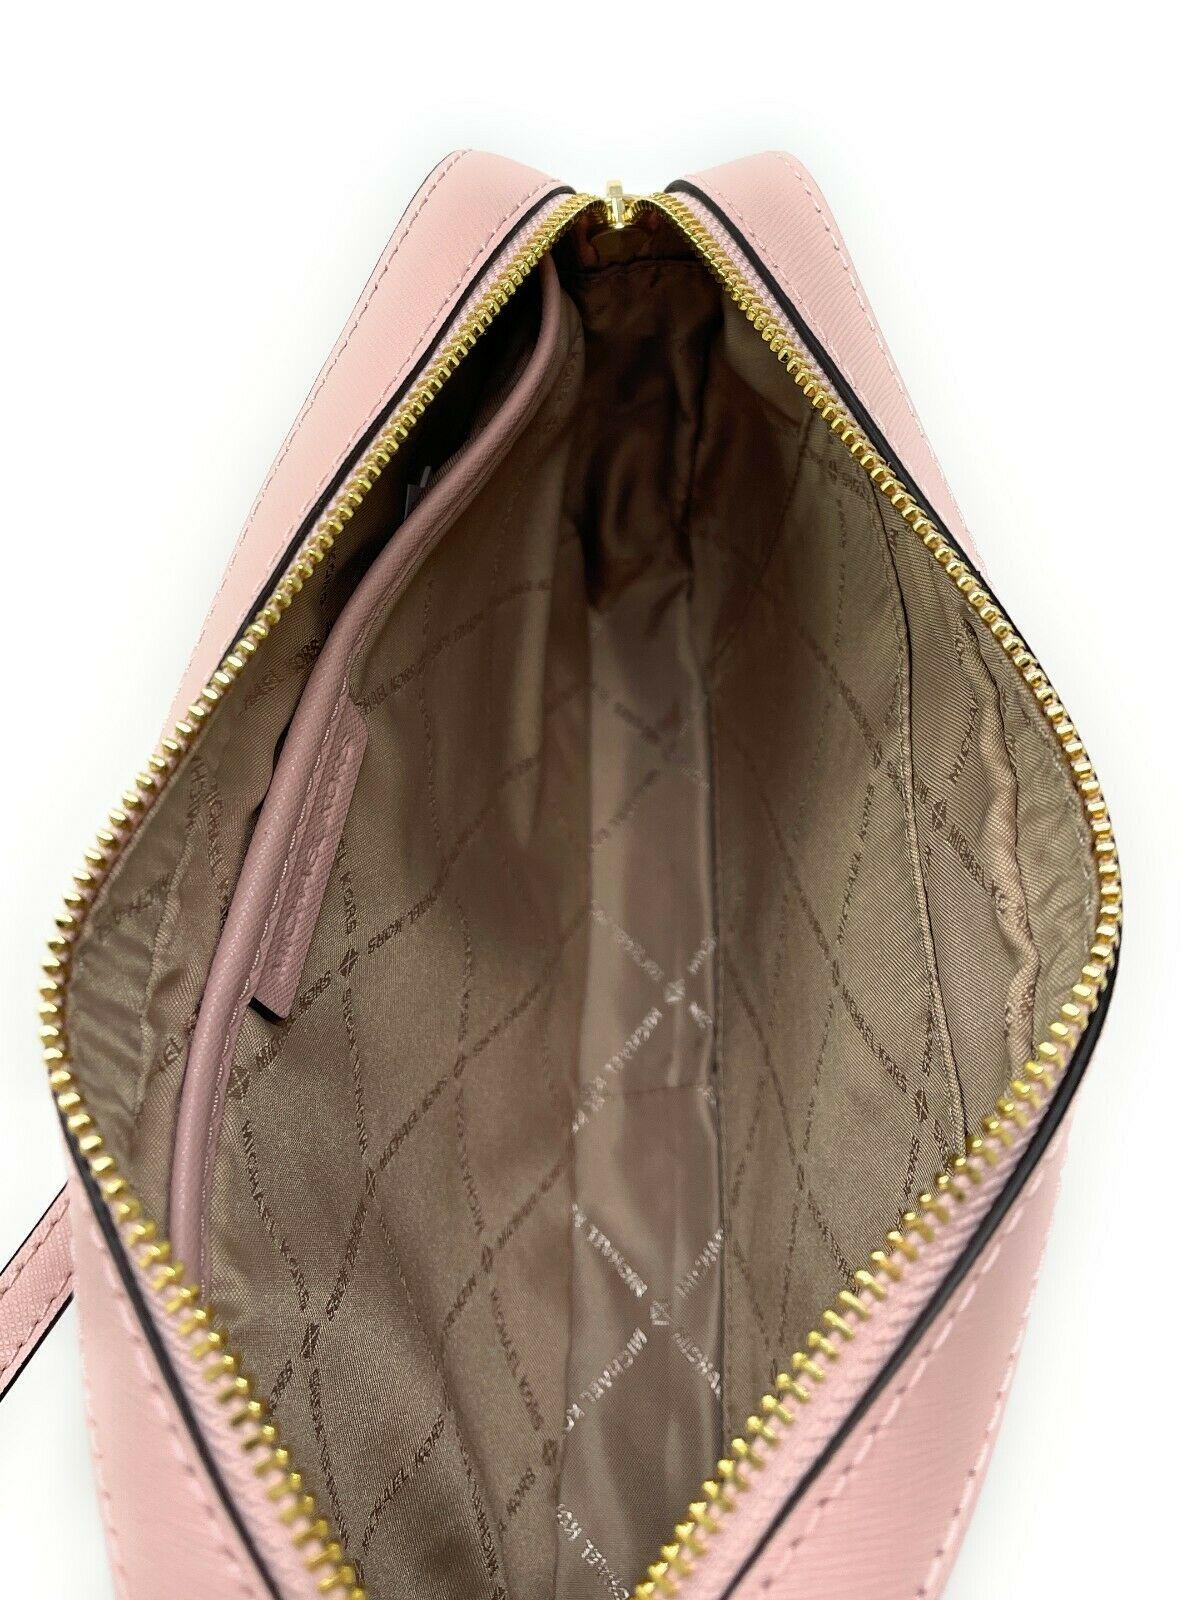 thumbnail 91 - Michael Kors Jet Set Item Large East West Crossbody Chain Handbag Clutch $298